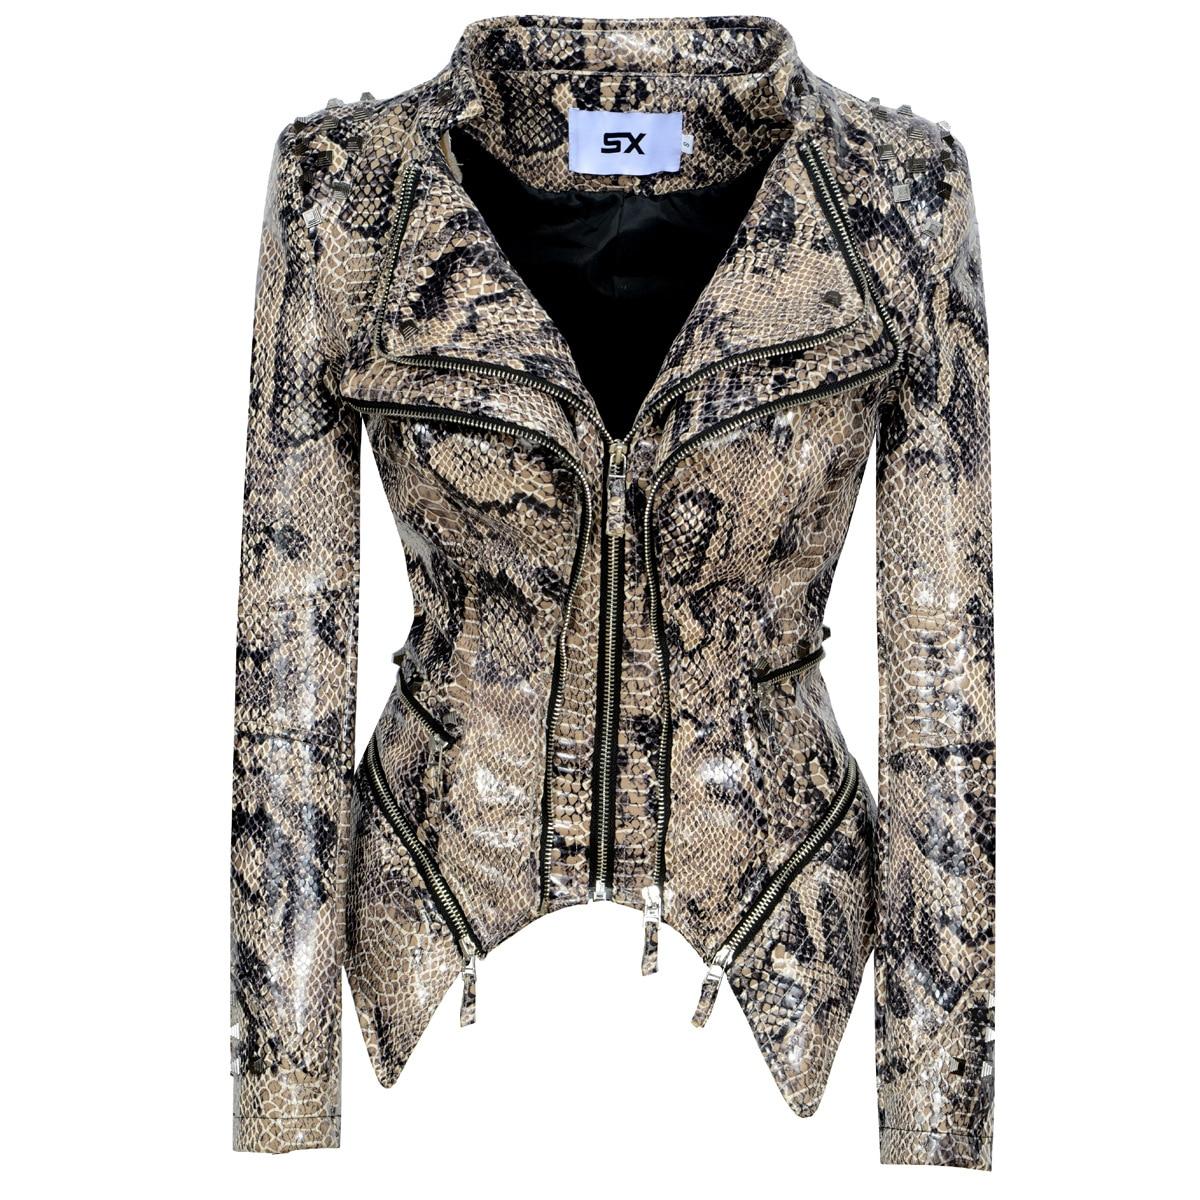 2020 Spring Autumn Leather Jacket Women Shrug Rivet Plus Size 3XL 4XL Washed Leopard Motorcycle PU Leather Jacket SX076